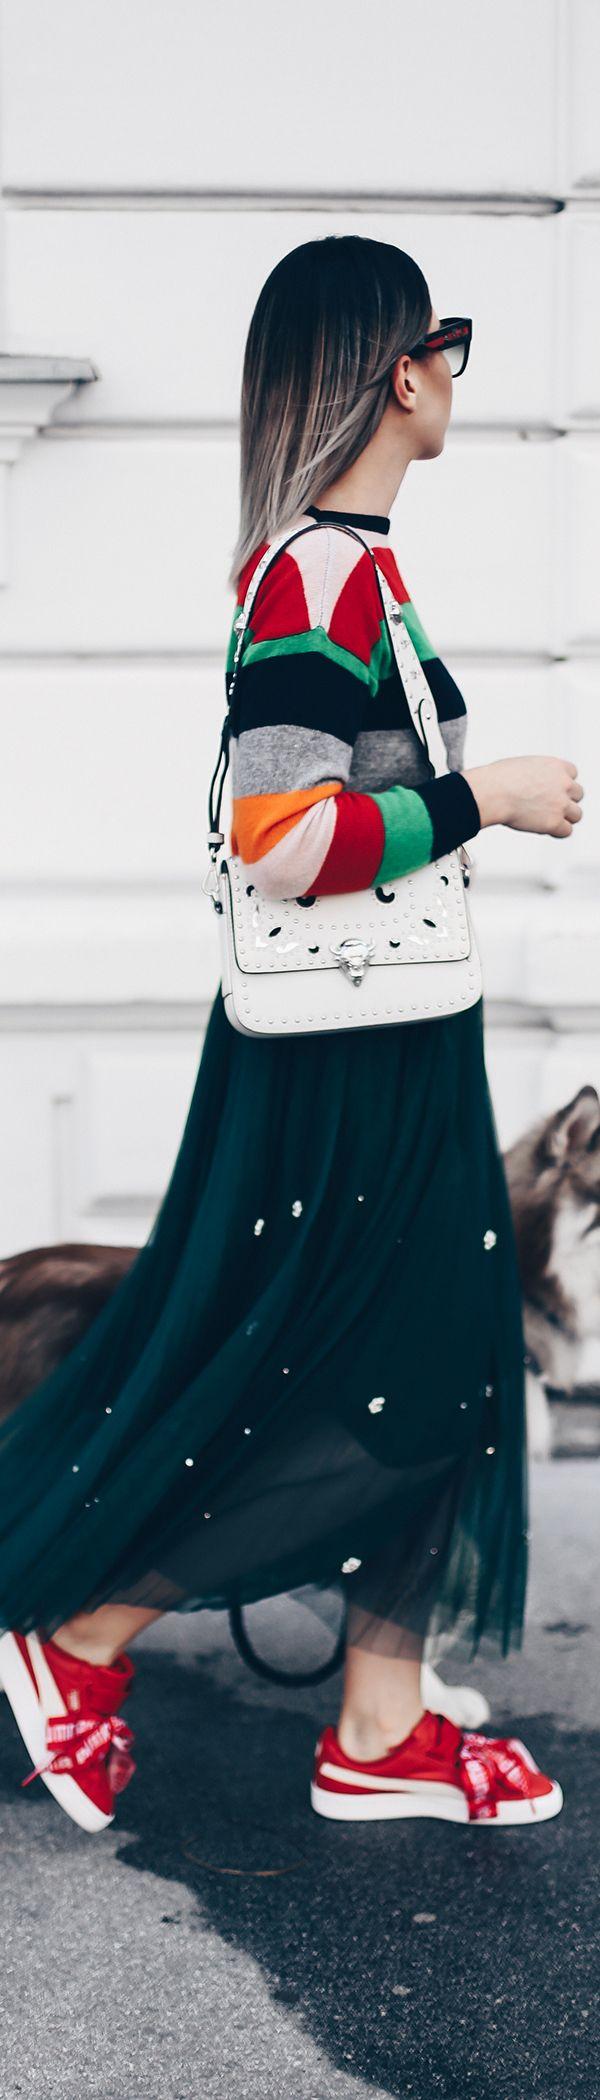 Tüllrock Outfit im Alltag kombinieren, Sneakers zum Rock, Styling Tipps, Outfit Ideen, Fashion Blog, Modeblog, Puma Basket Heart Sneakers, Bold Stripes Pullover, sibirischer Husky, Bloggerhund, Outfit Blog, www.whoismocca.com